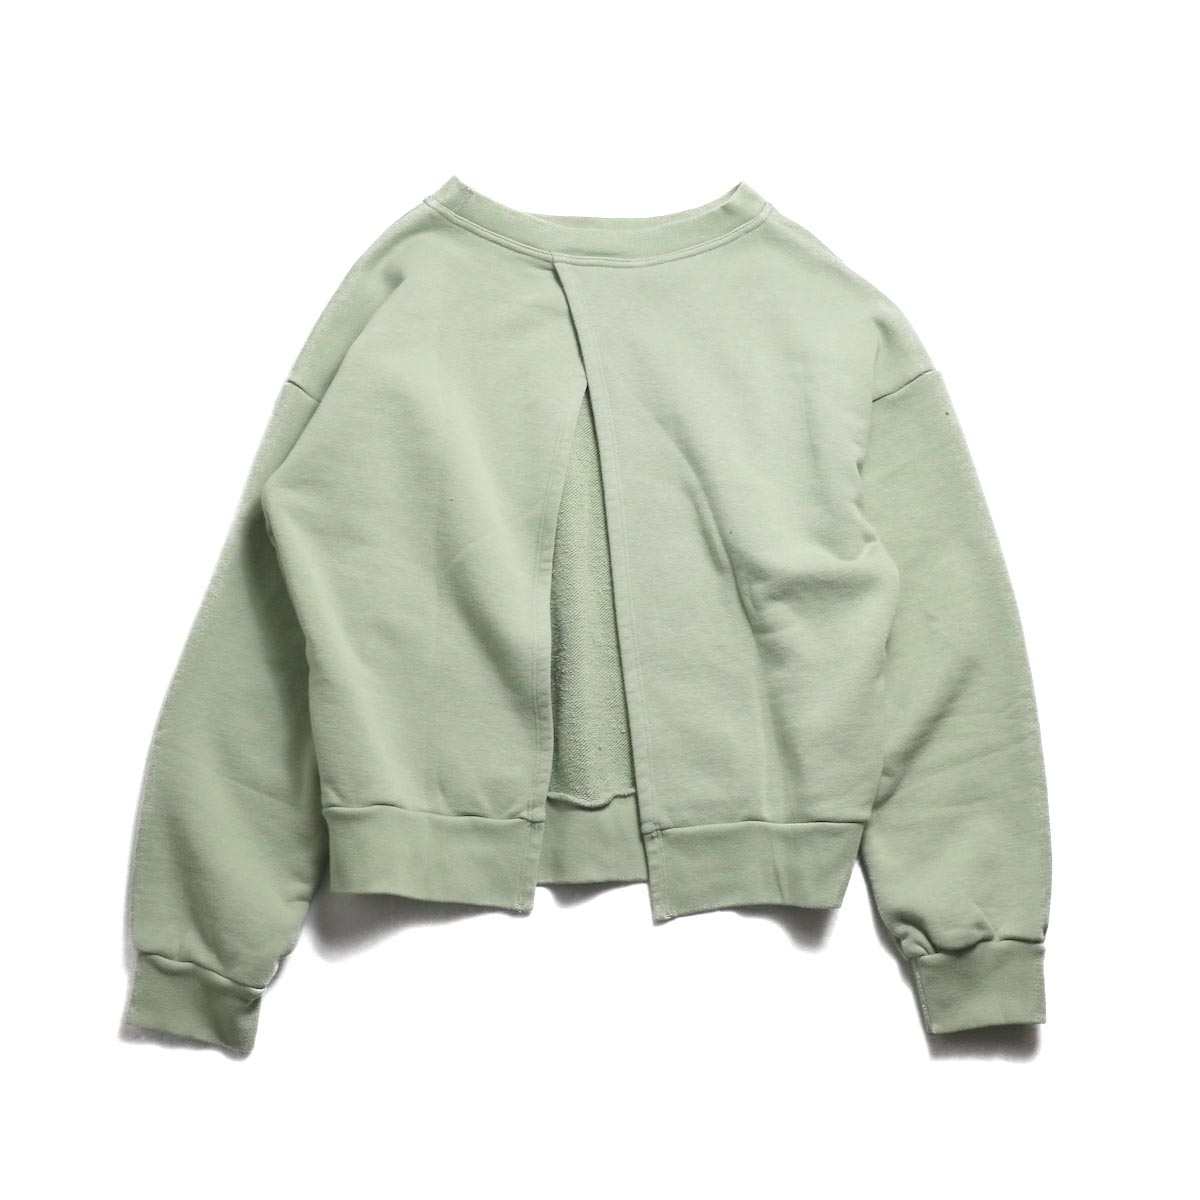 UNUSED (Ladie's) / US1530 Crew Neck Sweat Shirt -SAGE GREEN